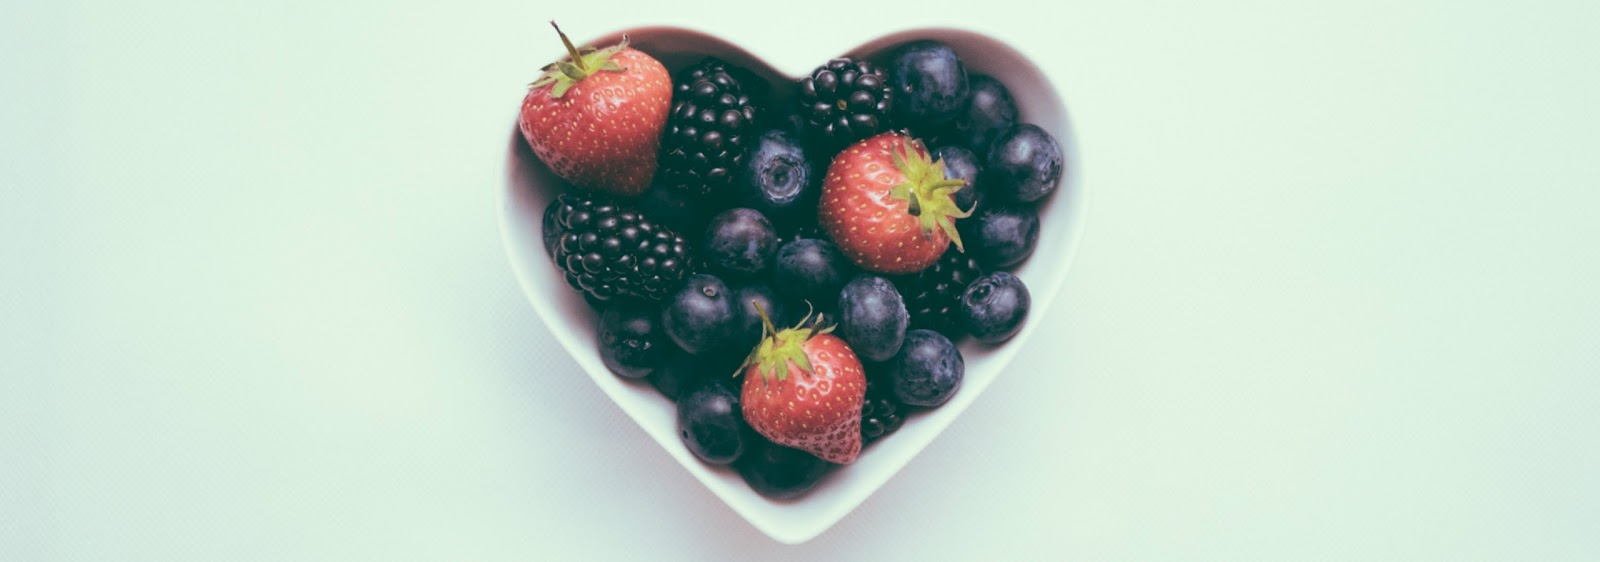 heart-shaped-bowl-of-fruit-on-white-background